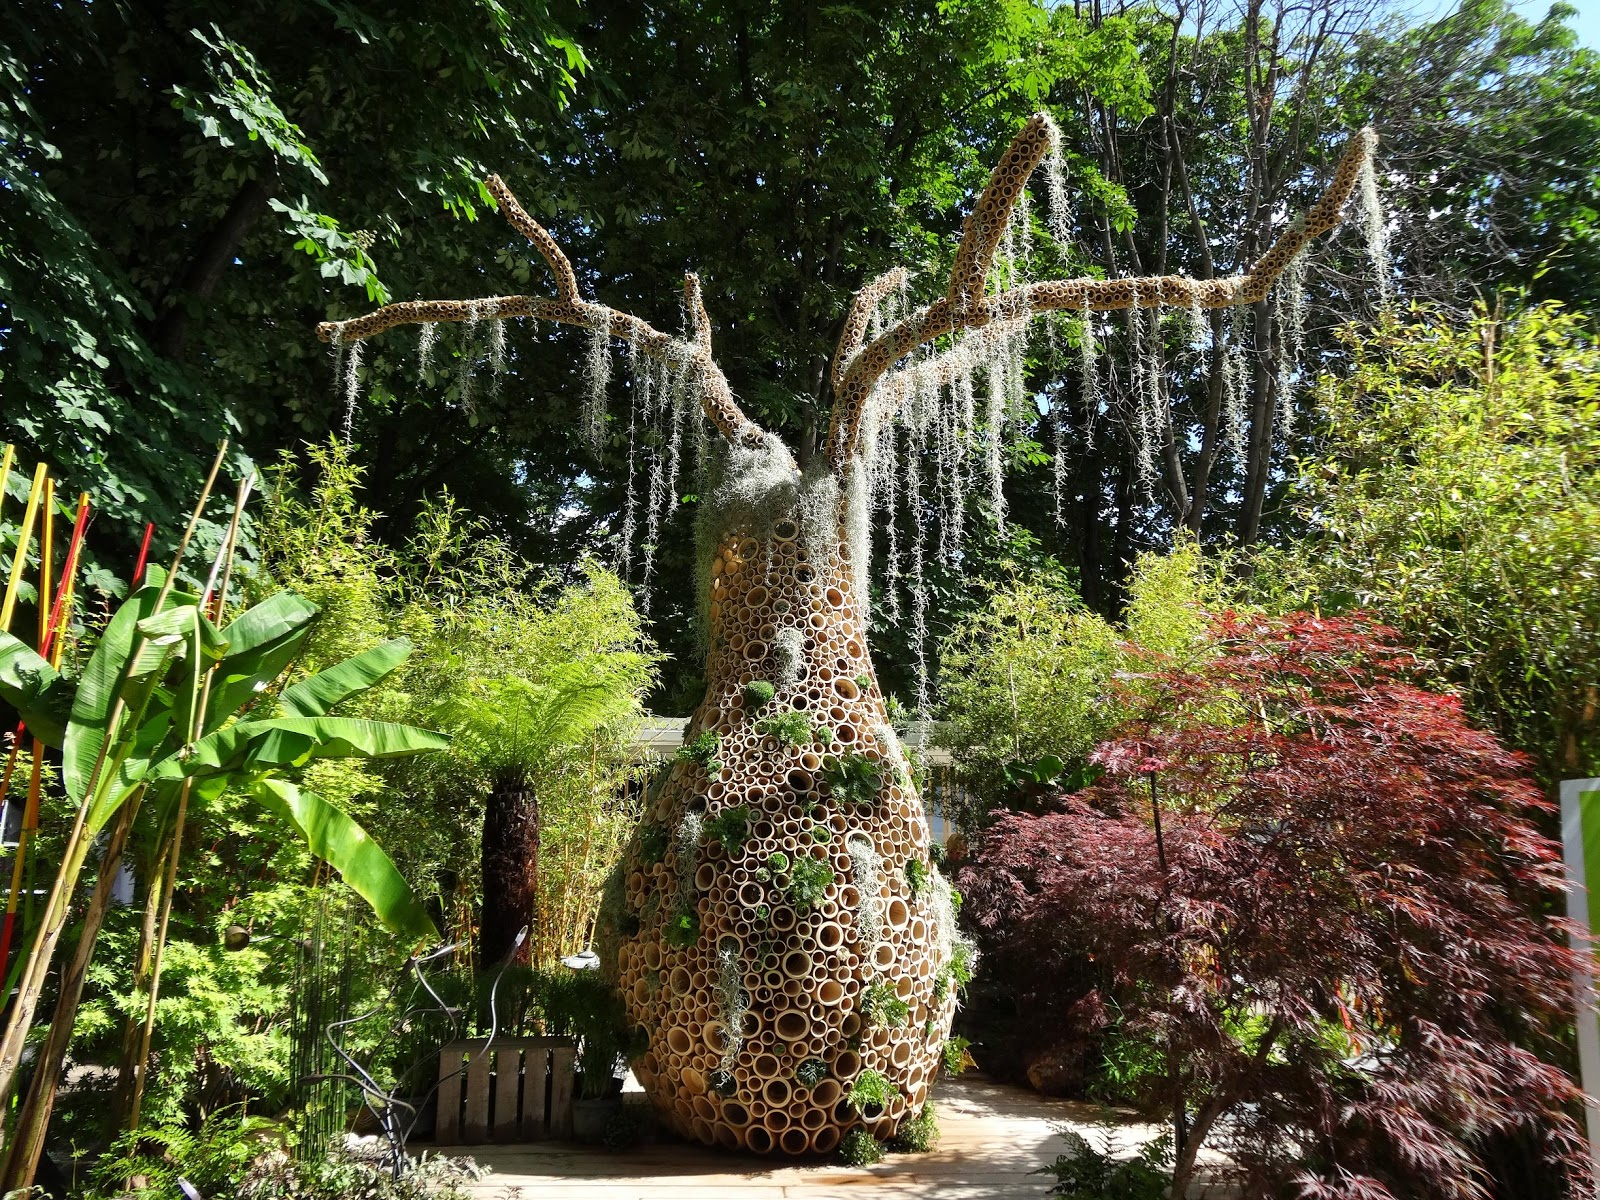 Le blog de parcs et jardins de l 39 oise jardins jardin for Art jardin ochsenfurt